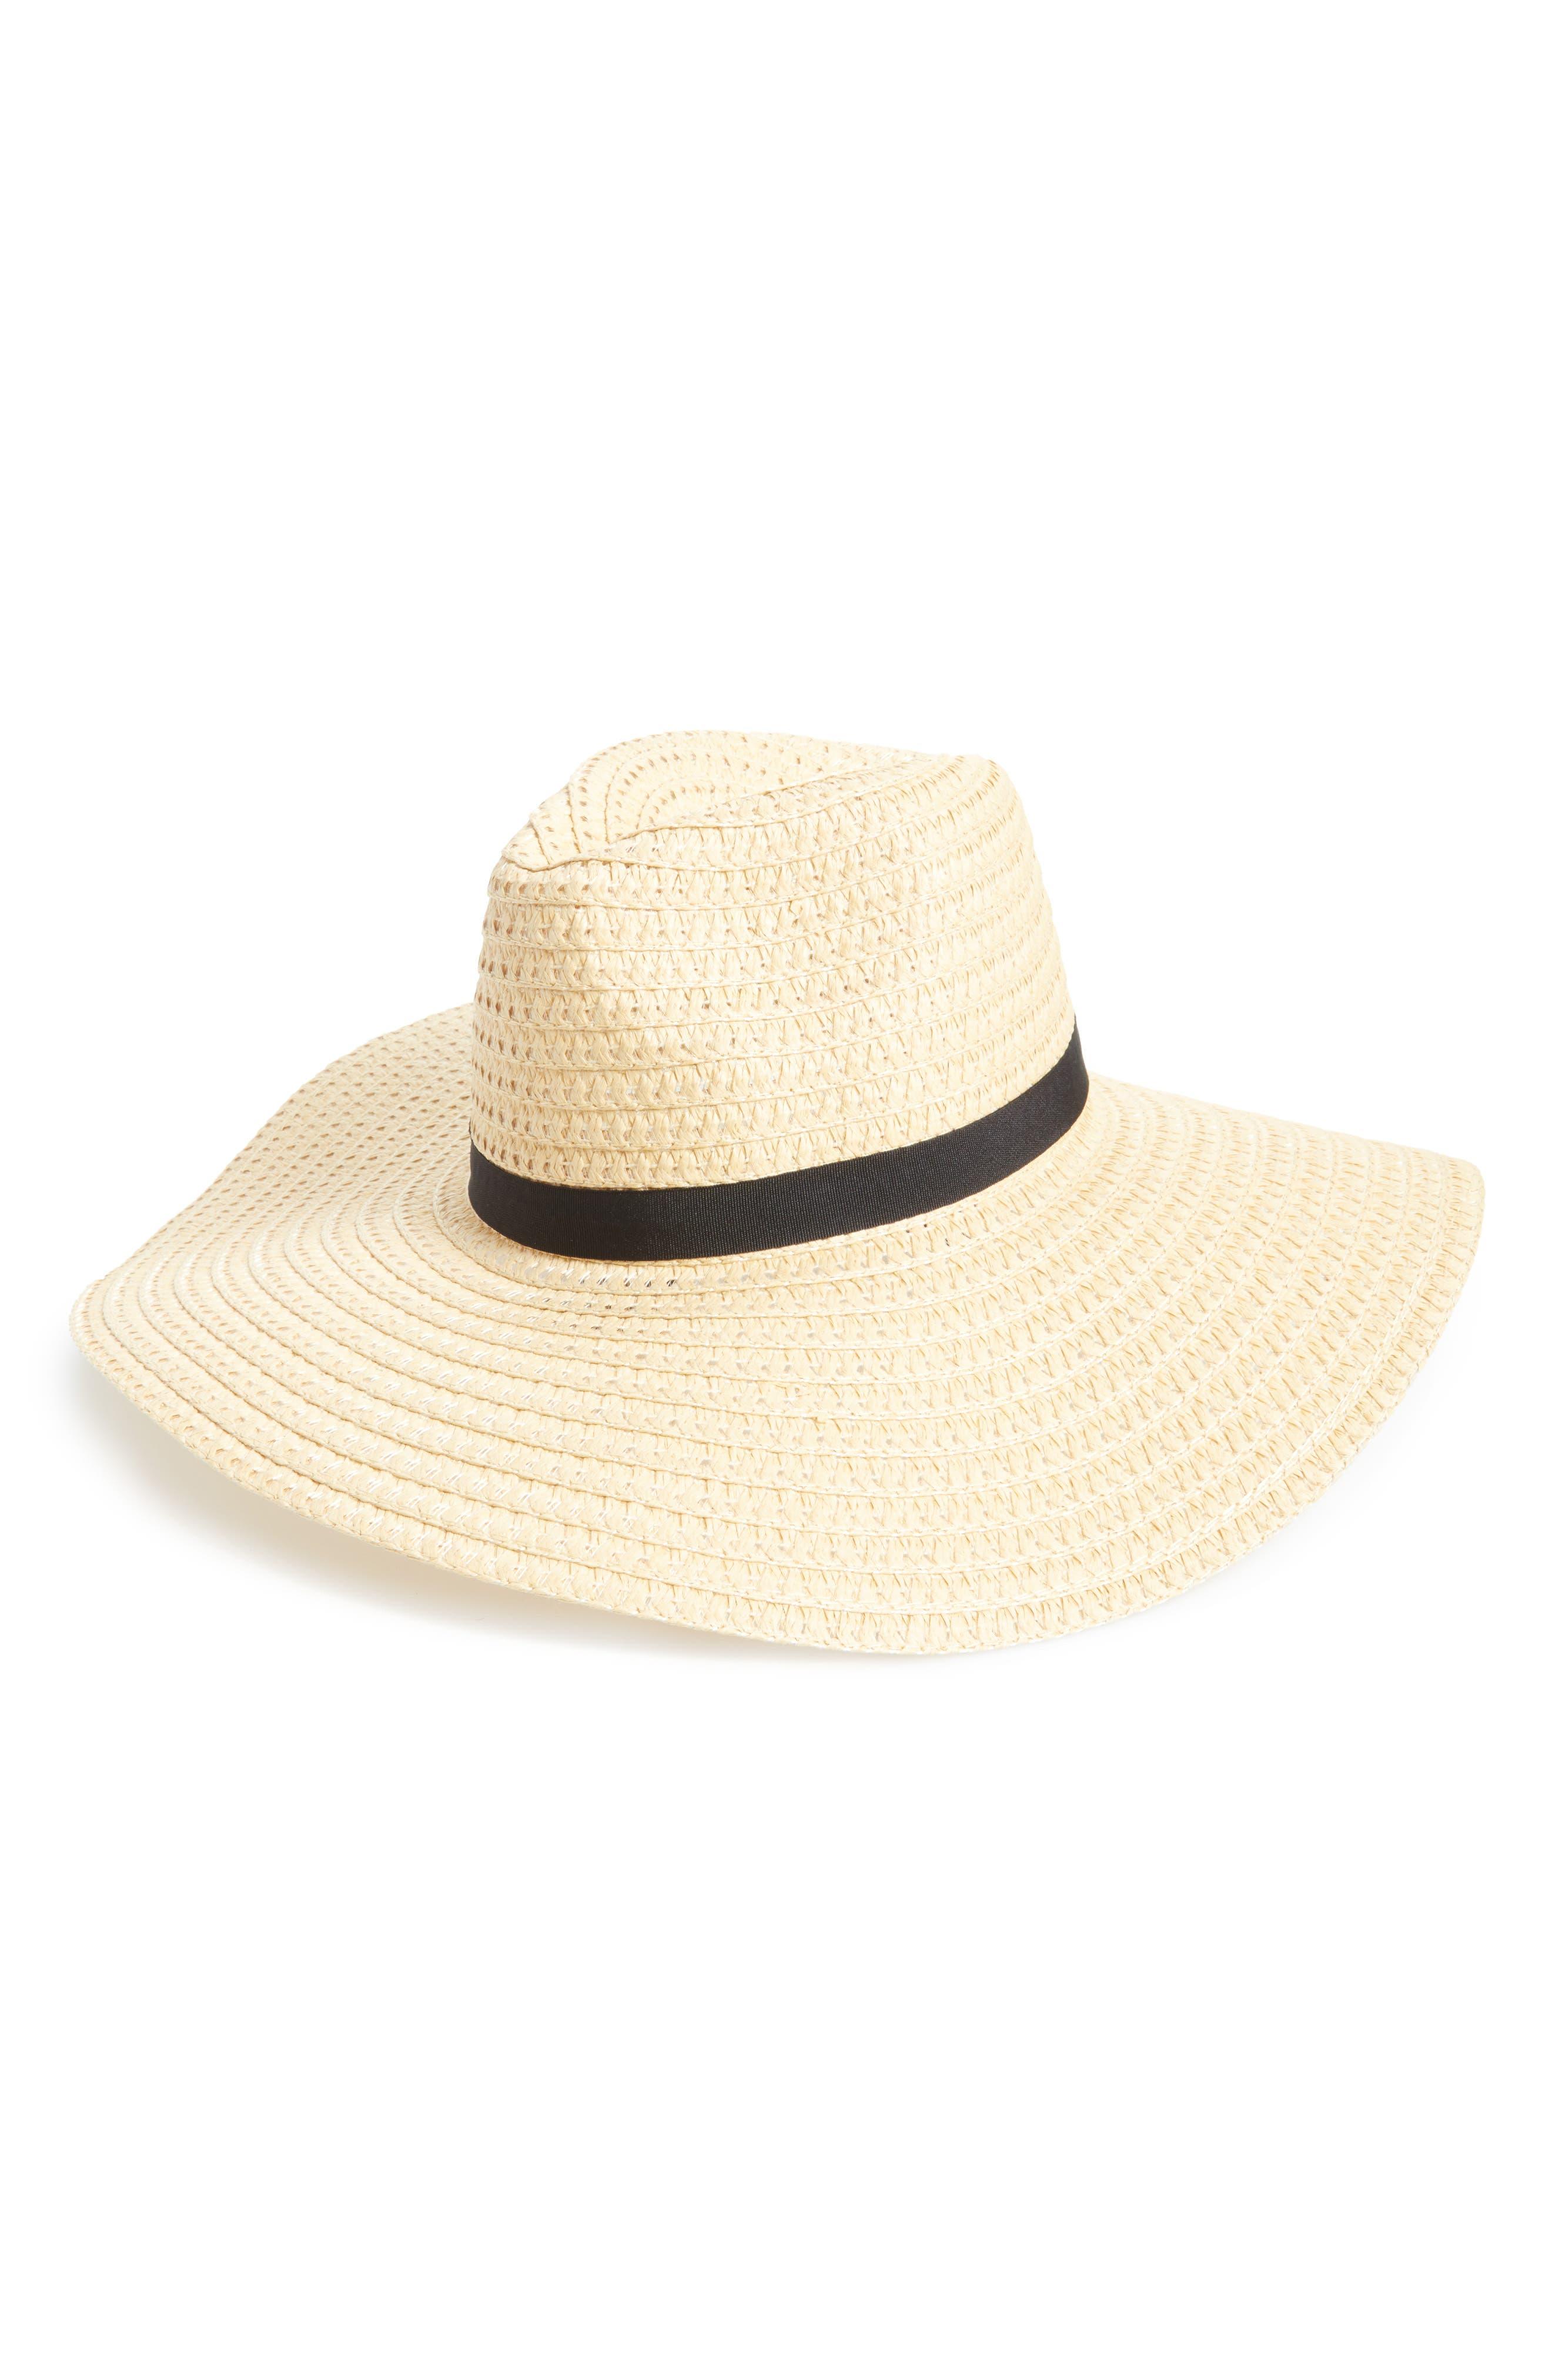 Wide Brim Staw Hat,                             Main thumbnail 1, color,                             Natural/ Black